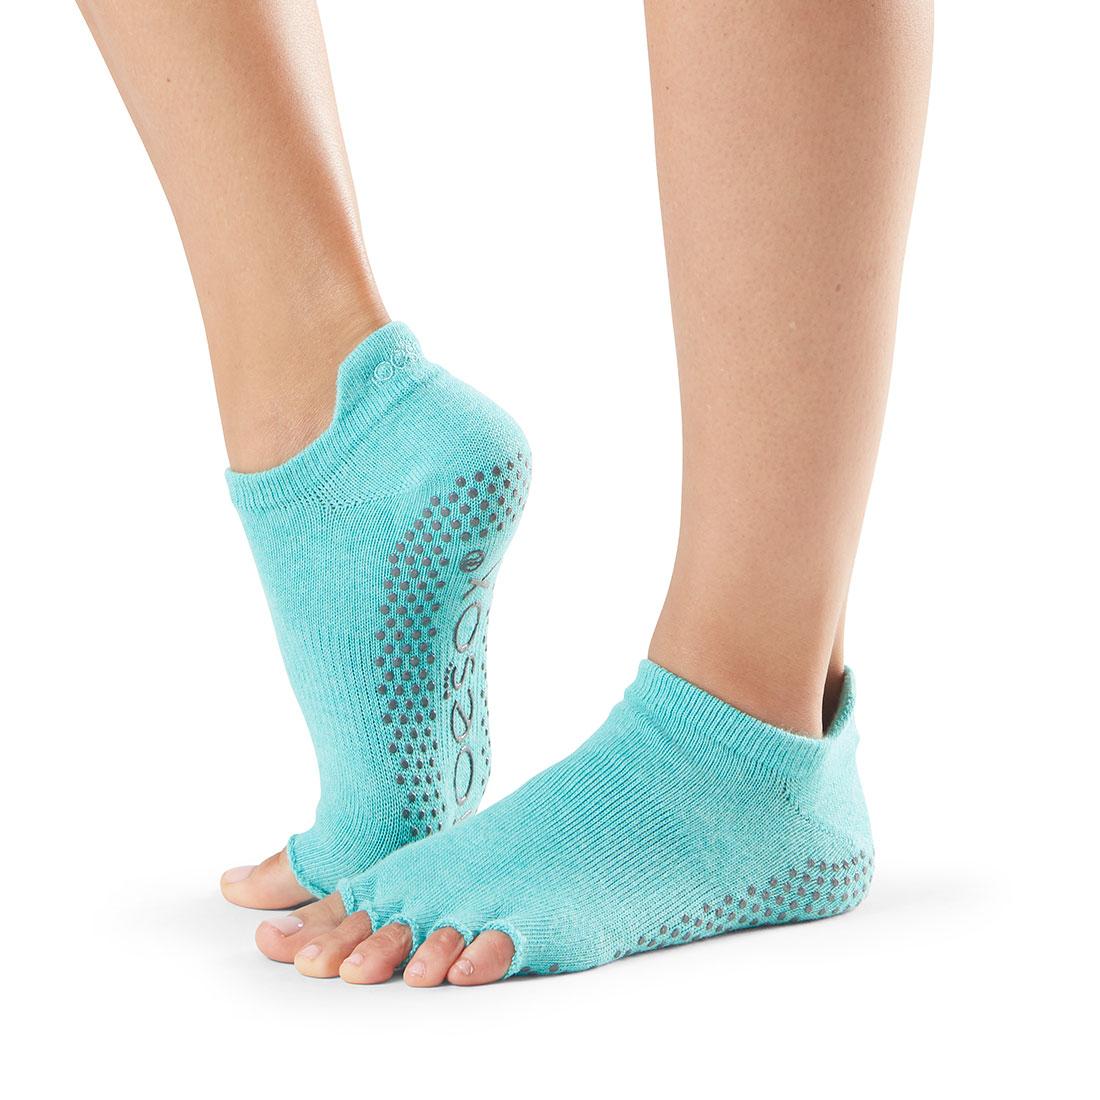 Yogasocken ToeSox Low Rise Half Toe Aqua